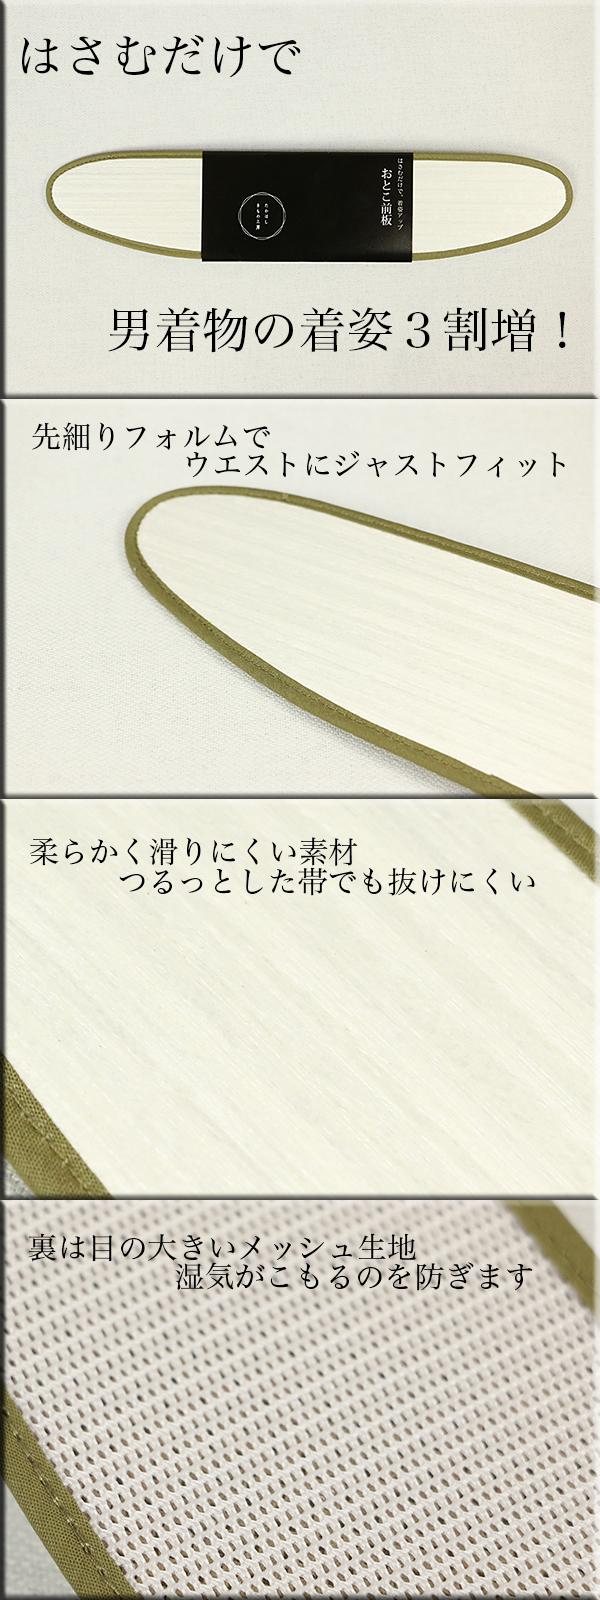 hakata_nishimura_02